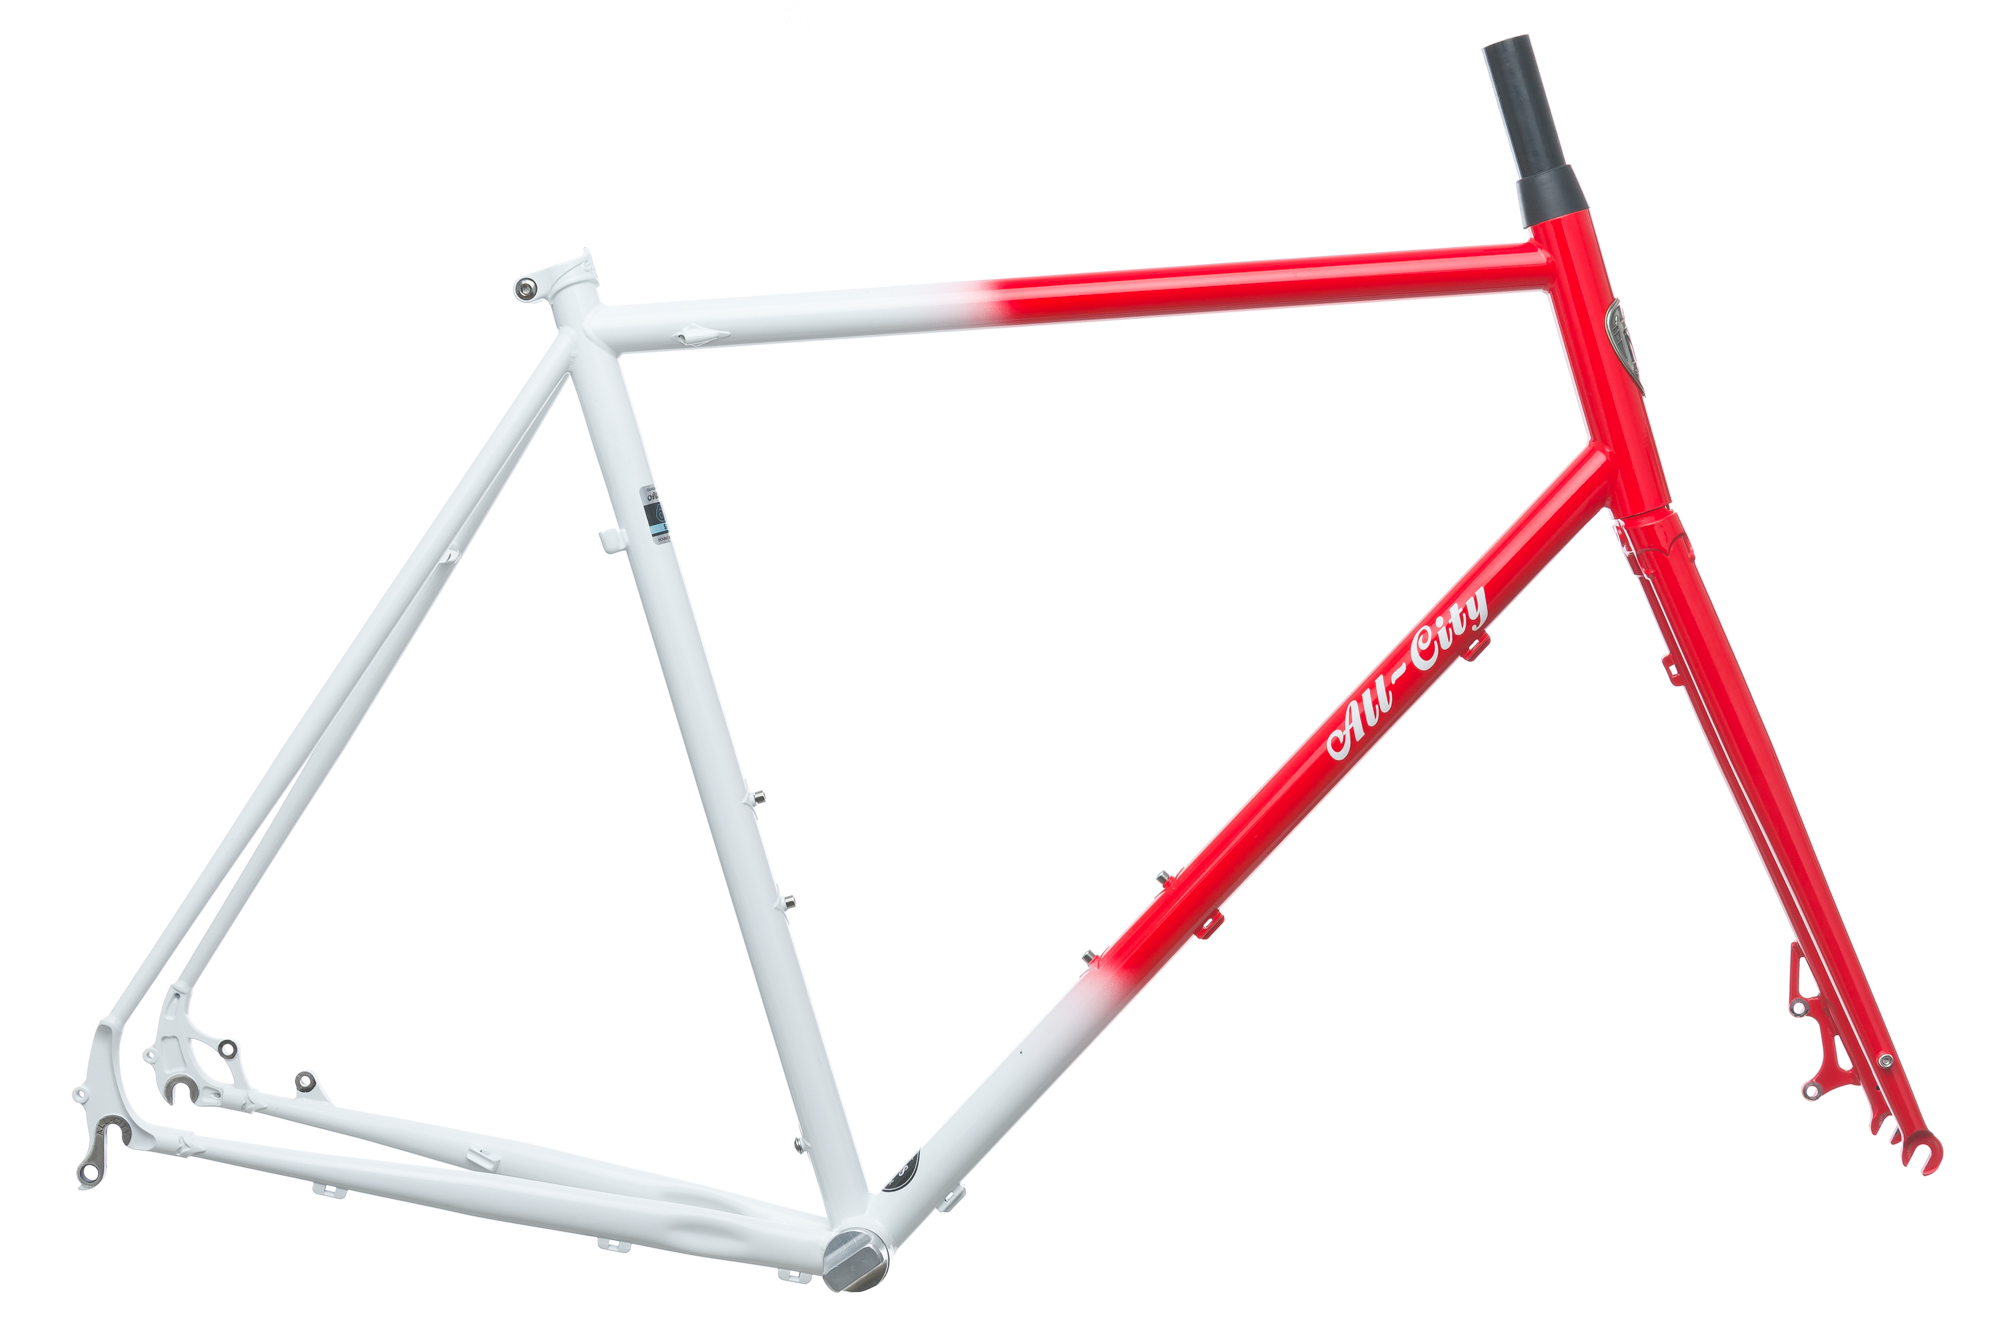 2017 All-City Macho Man Disc Cyclocross Bike Frame Set 58cm Large ...